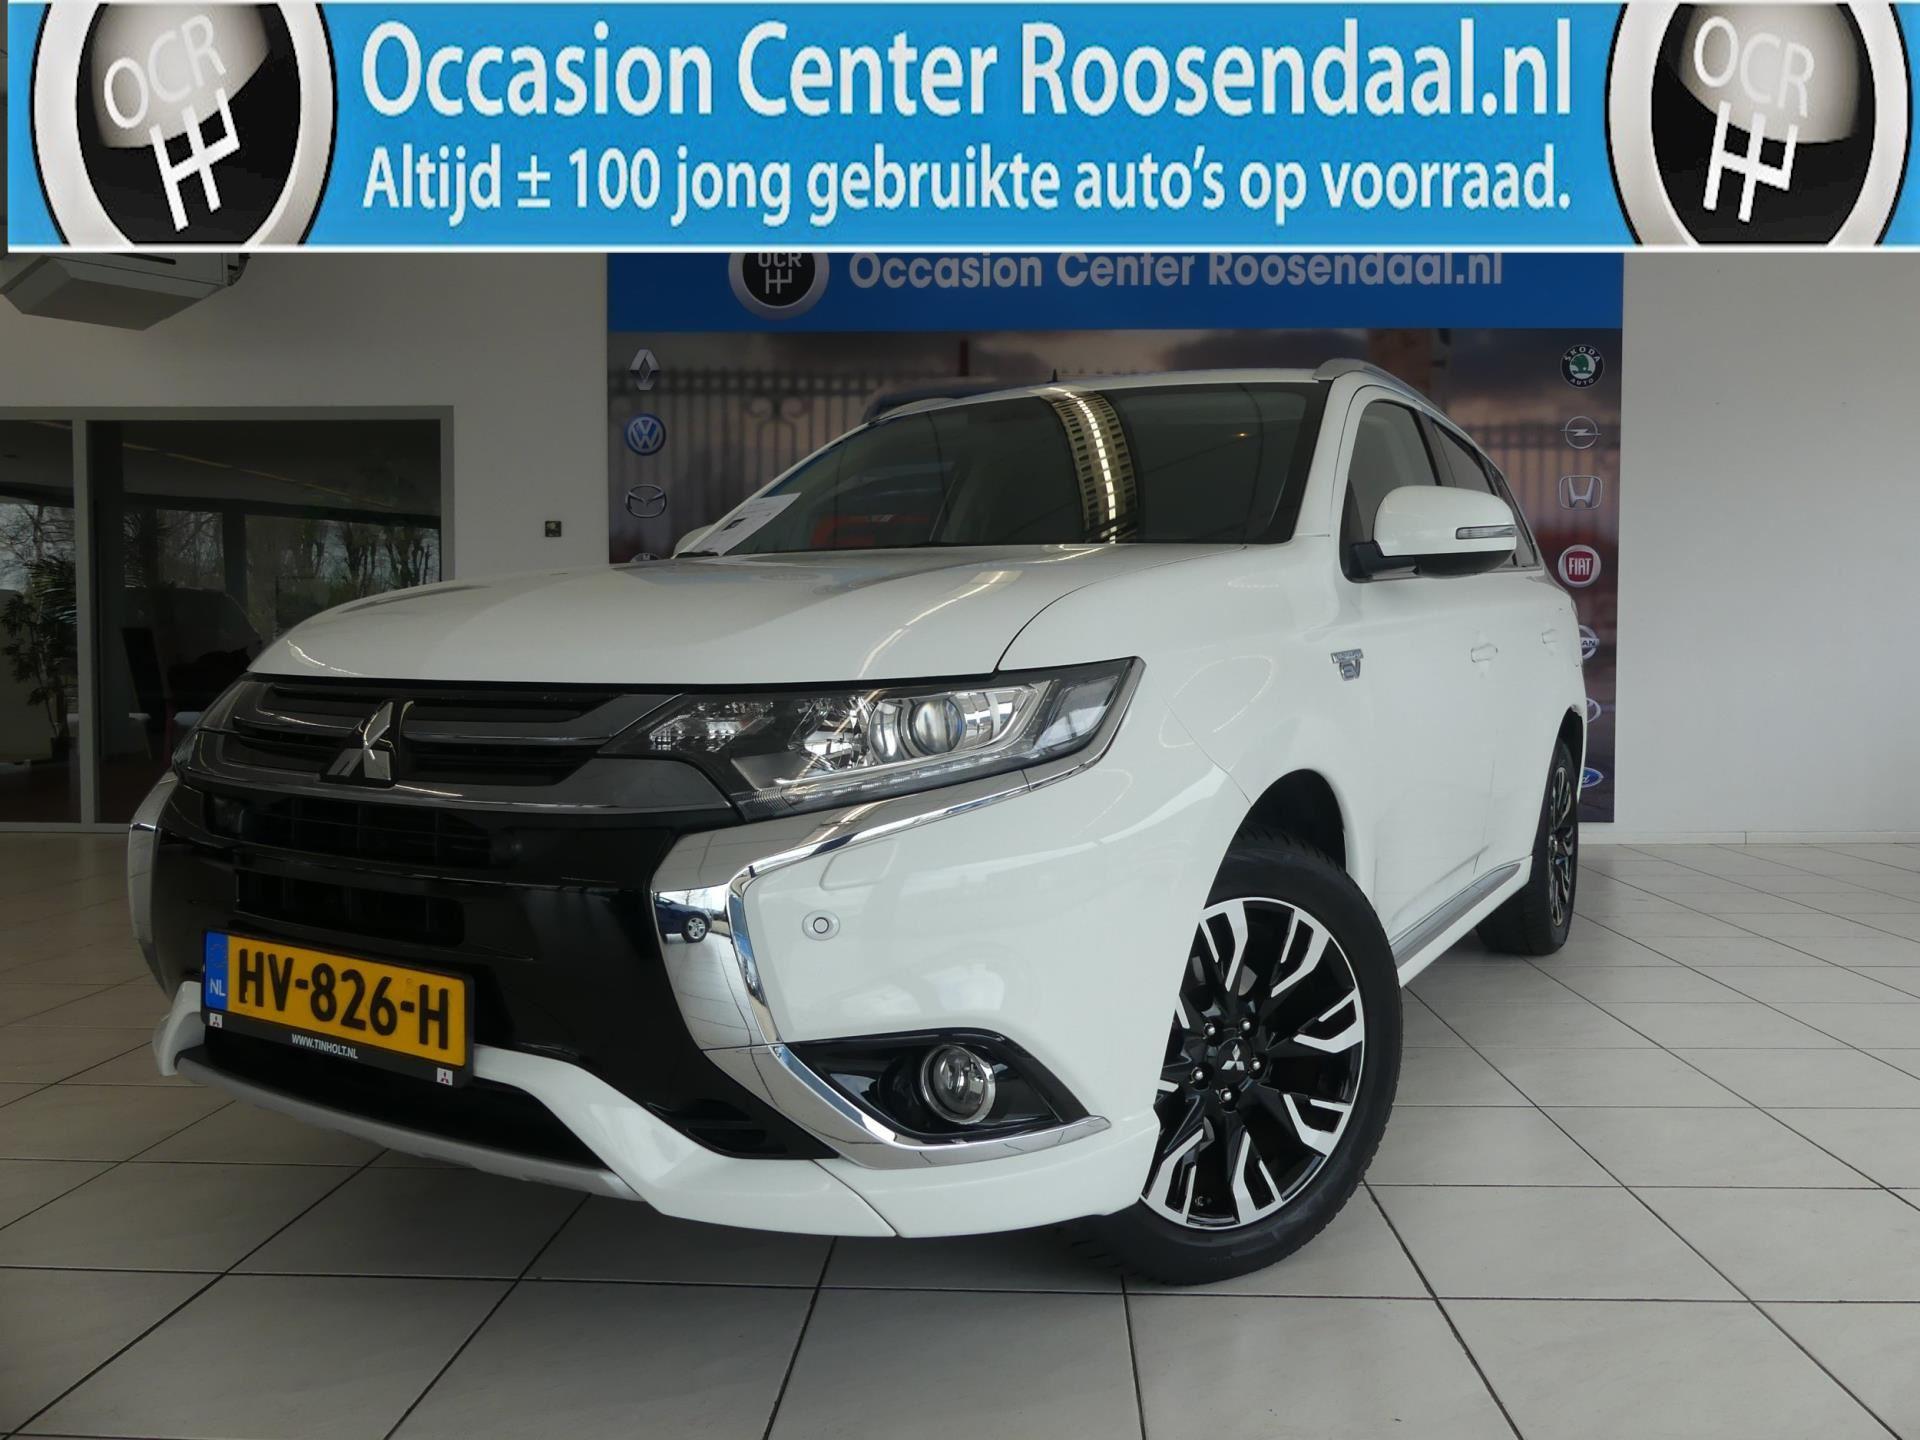 Mitsubishi Outlander occasion - Occasion Center Roosendaal